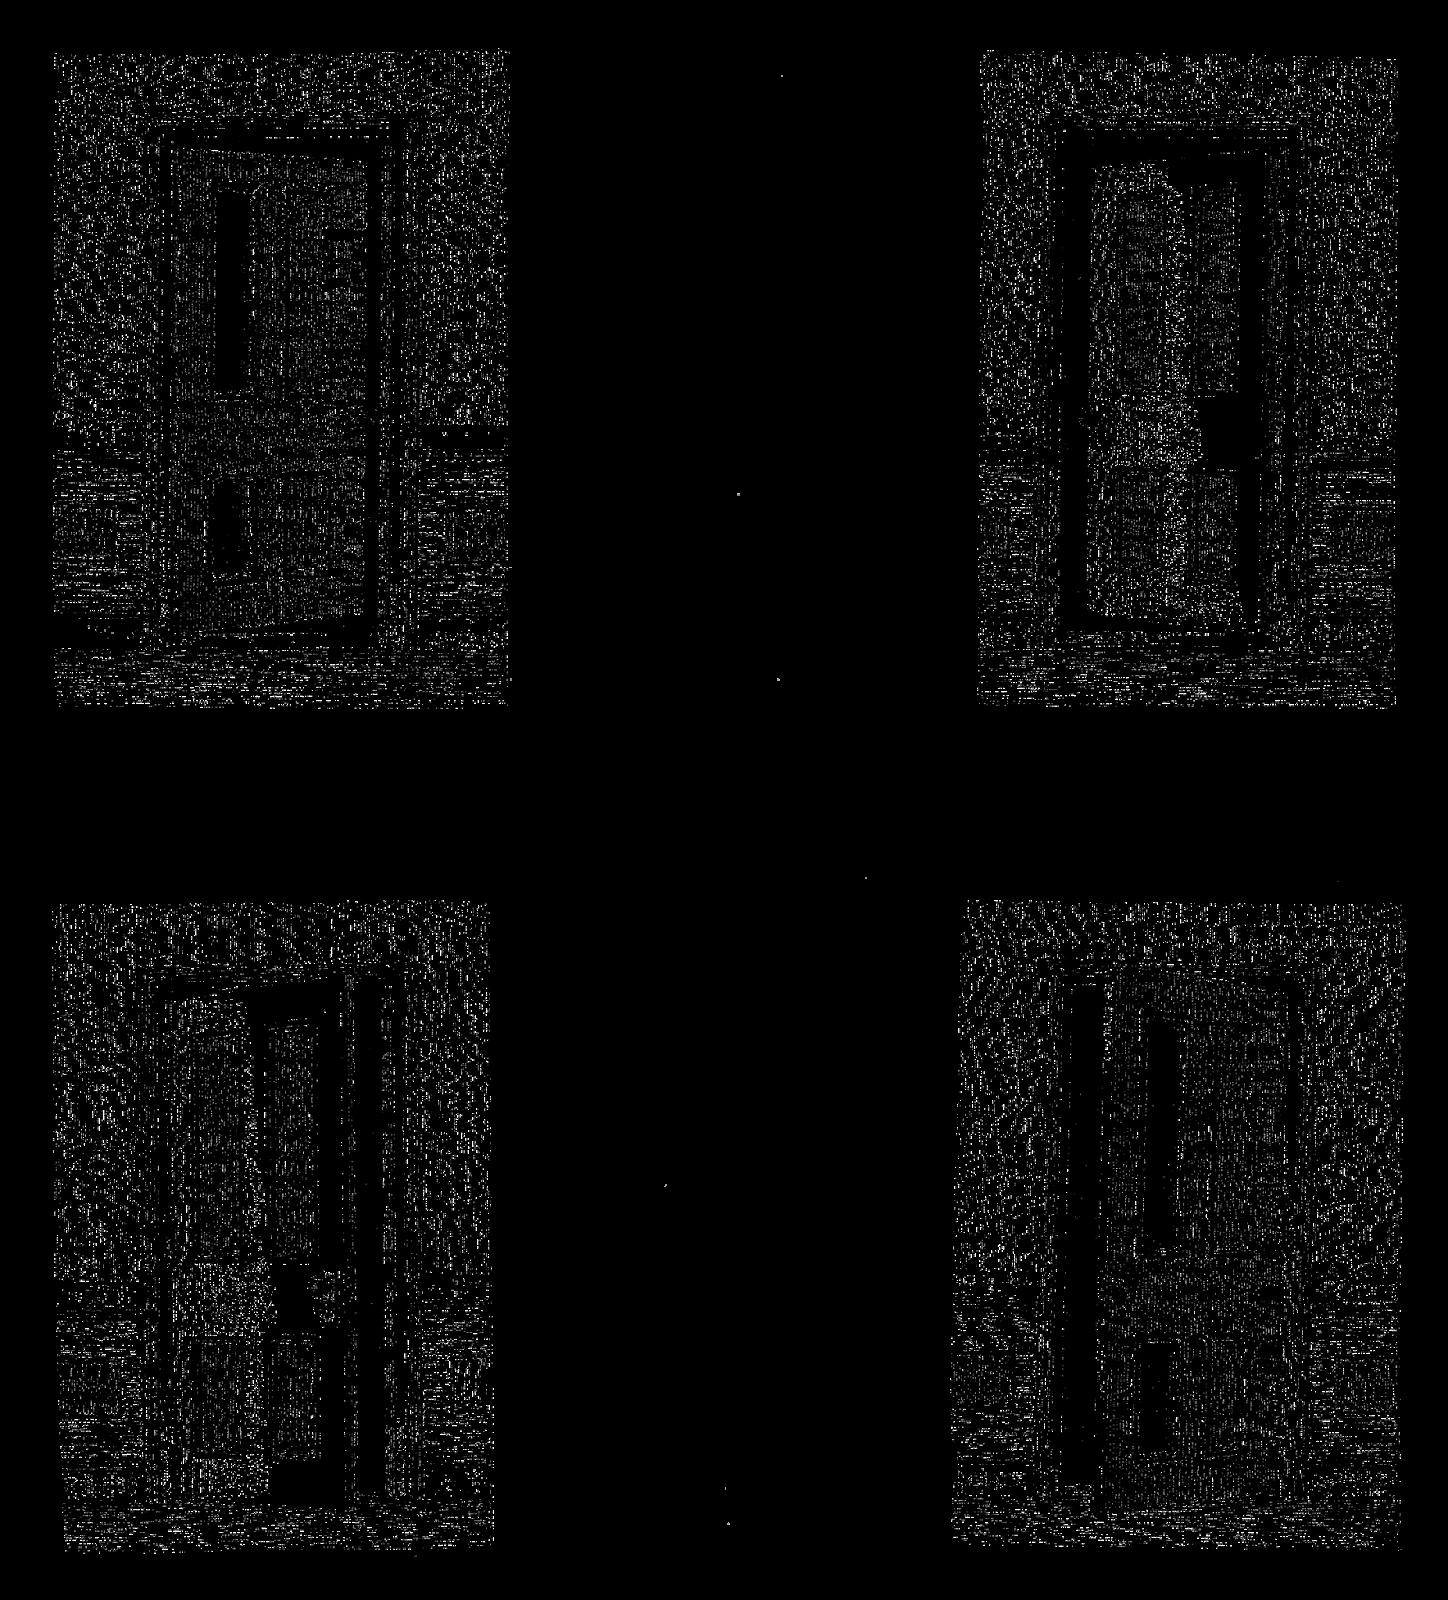 Antique Images: 4 Doors Digital Collage Sheet Vintage Decor Clip.